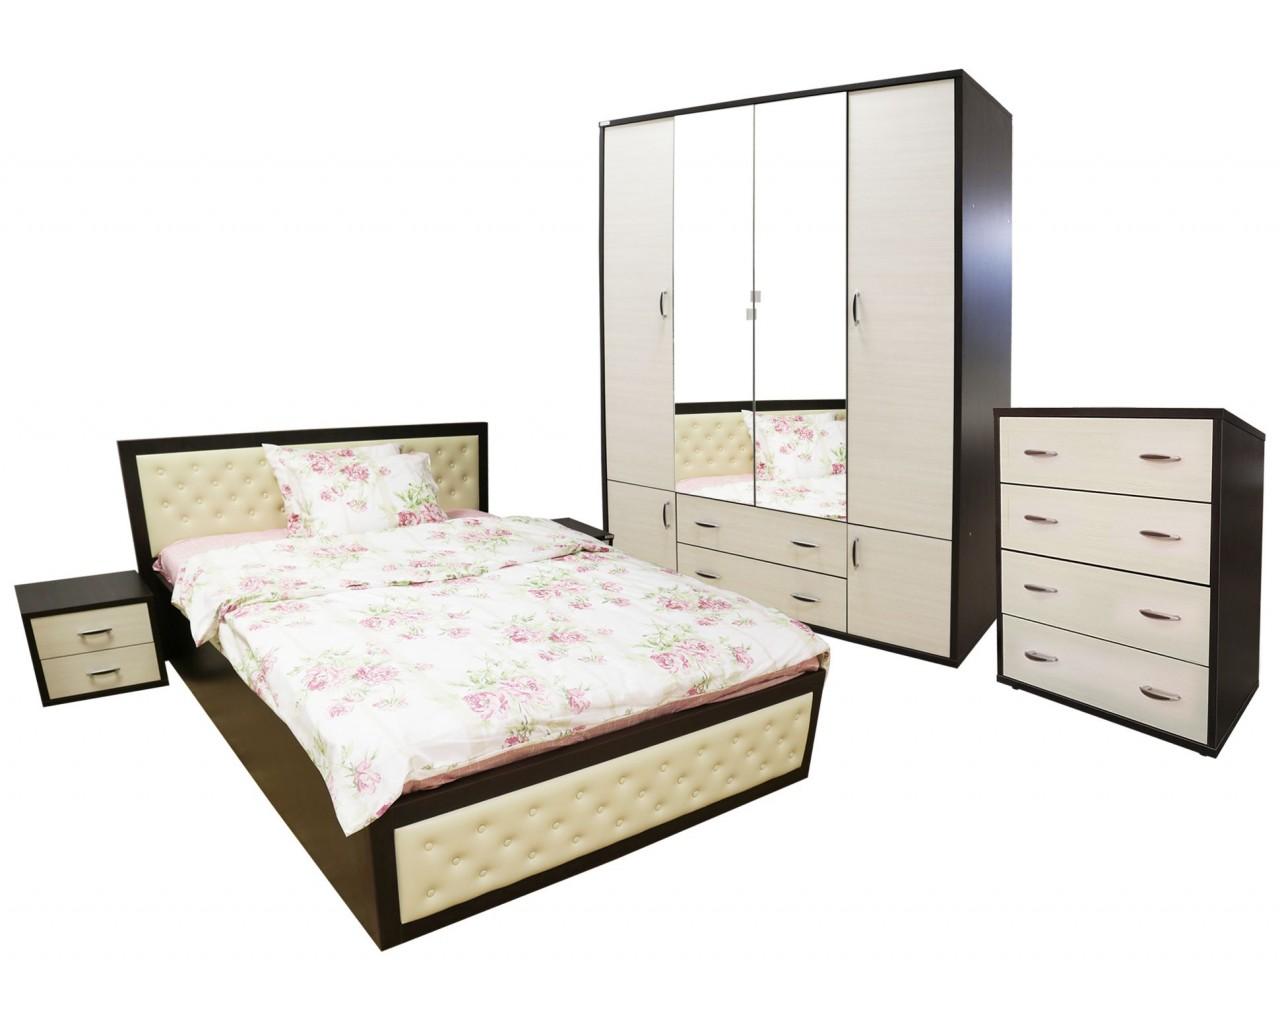 dormitor-torino-cu-pat-140×200-cm-1280×1024